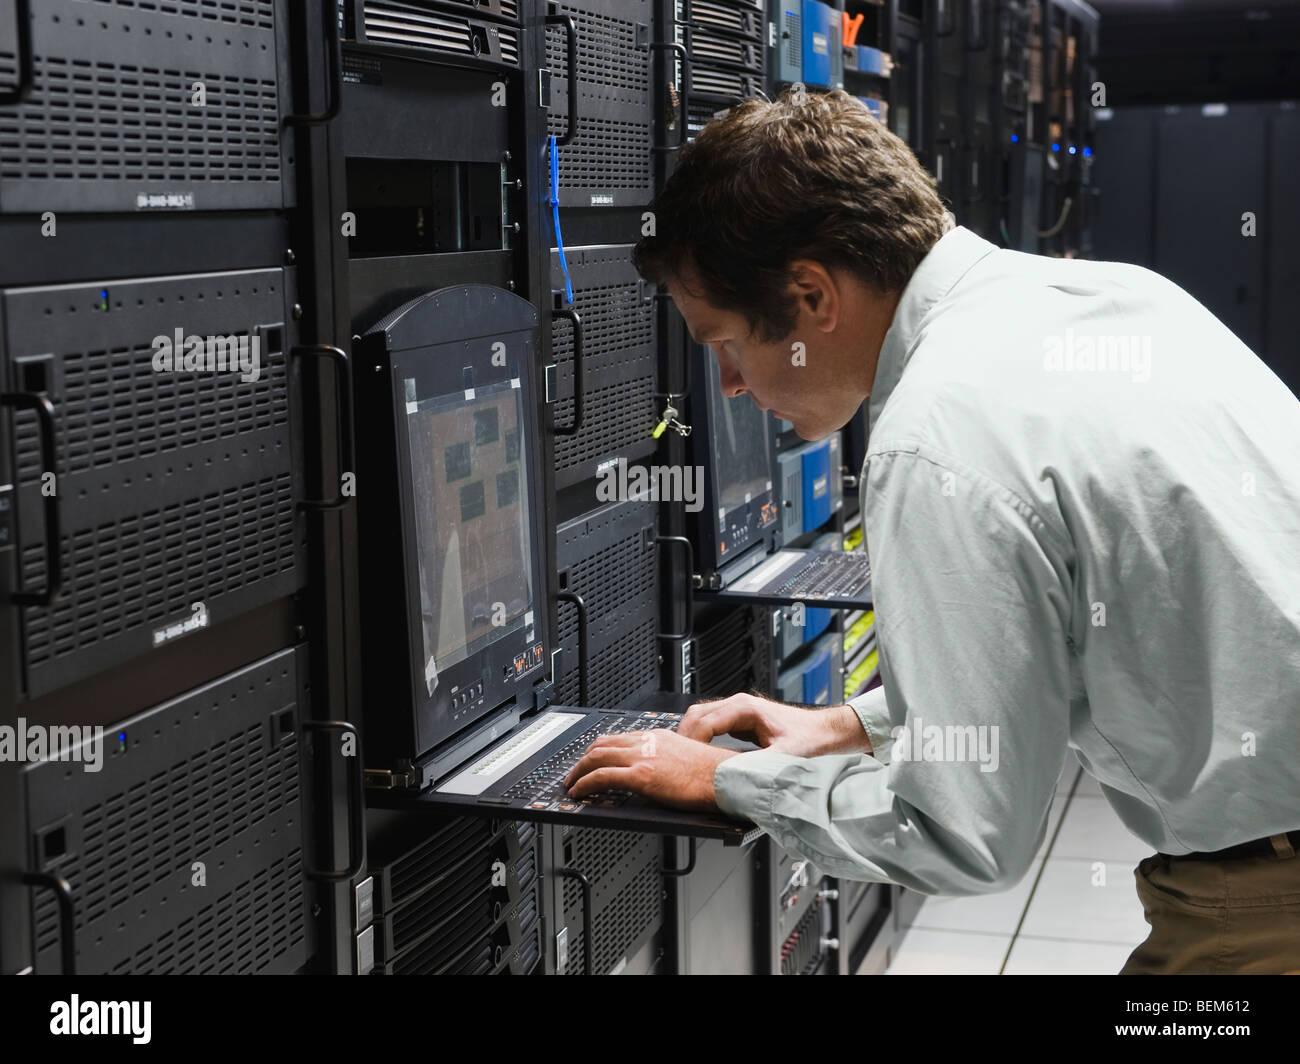 Man working in data center - Stock Image